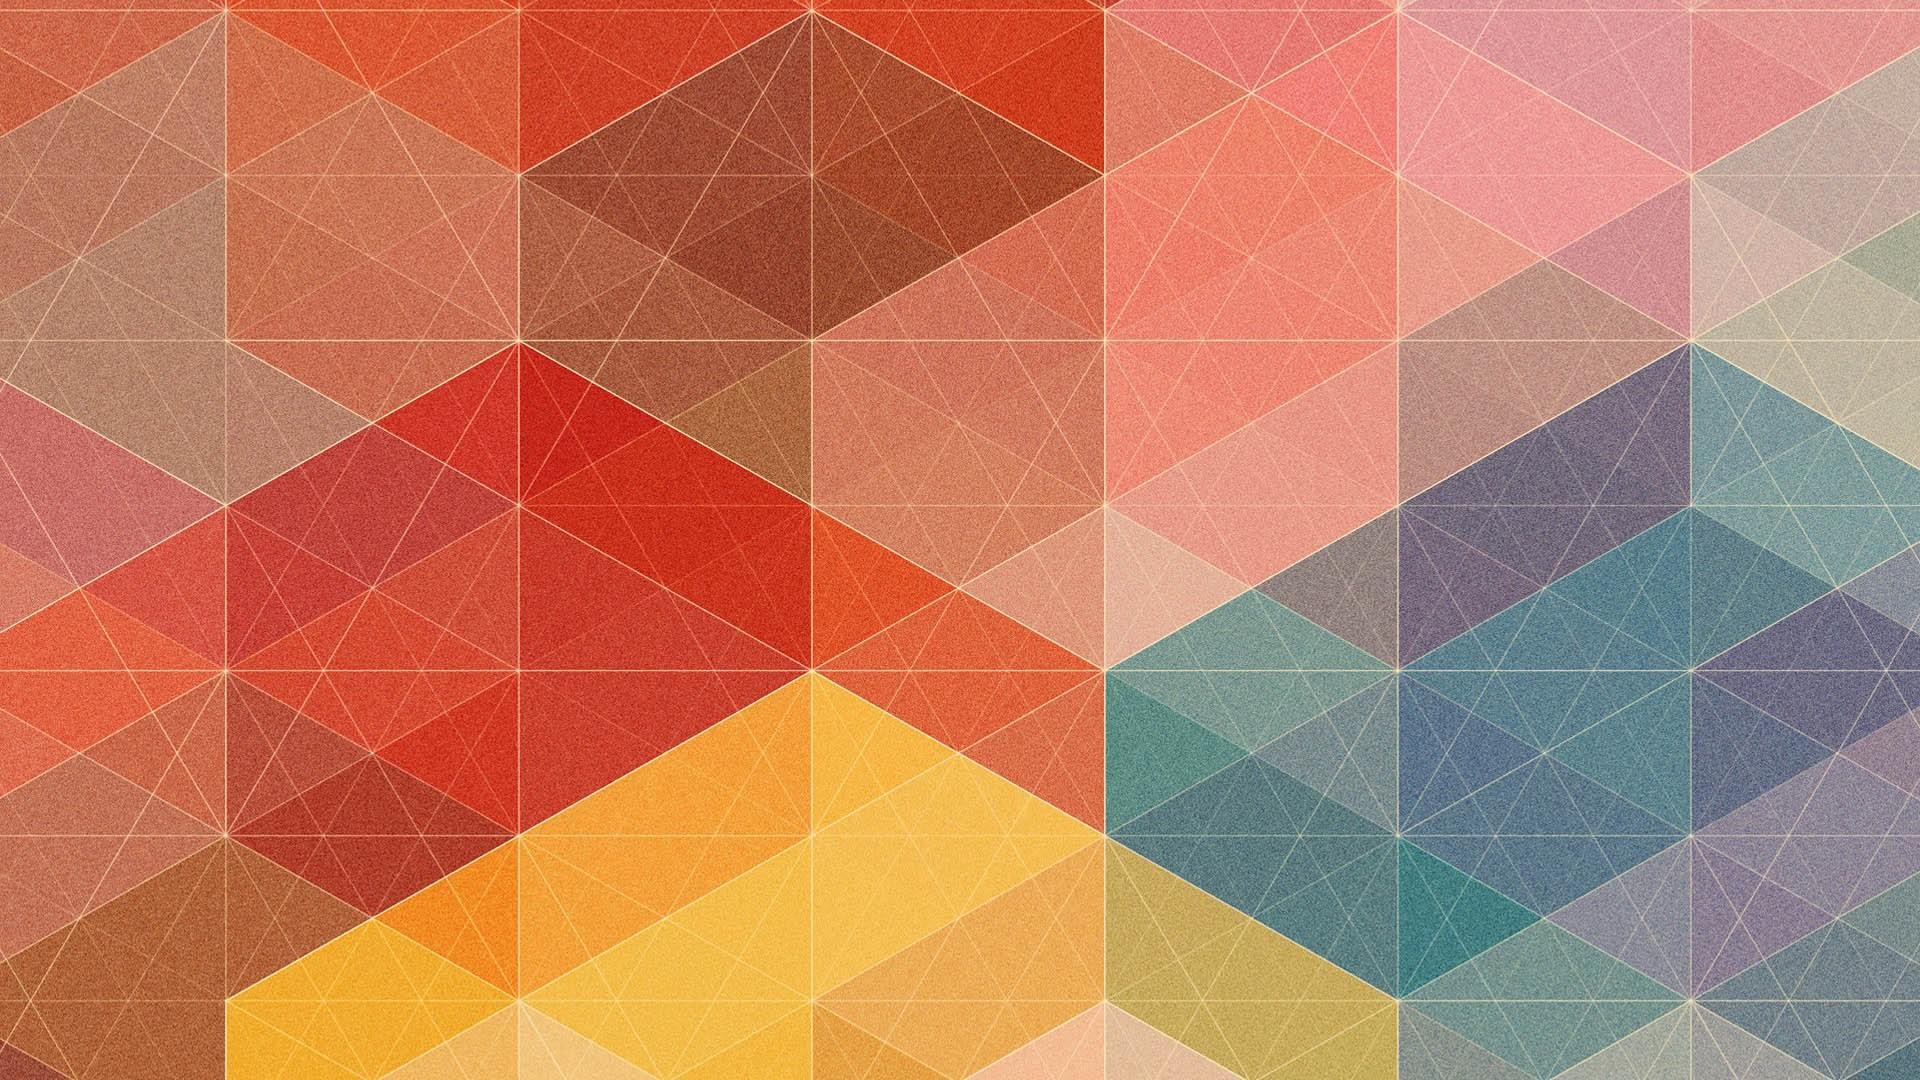 Top Wallpaper Mac Geometric - 197863-download-geometric-backgrounds-1920x1080  Gallery_784763.jpg